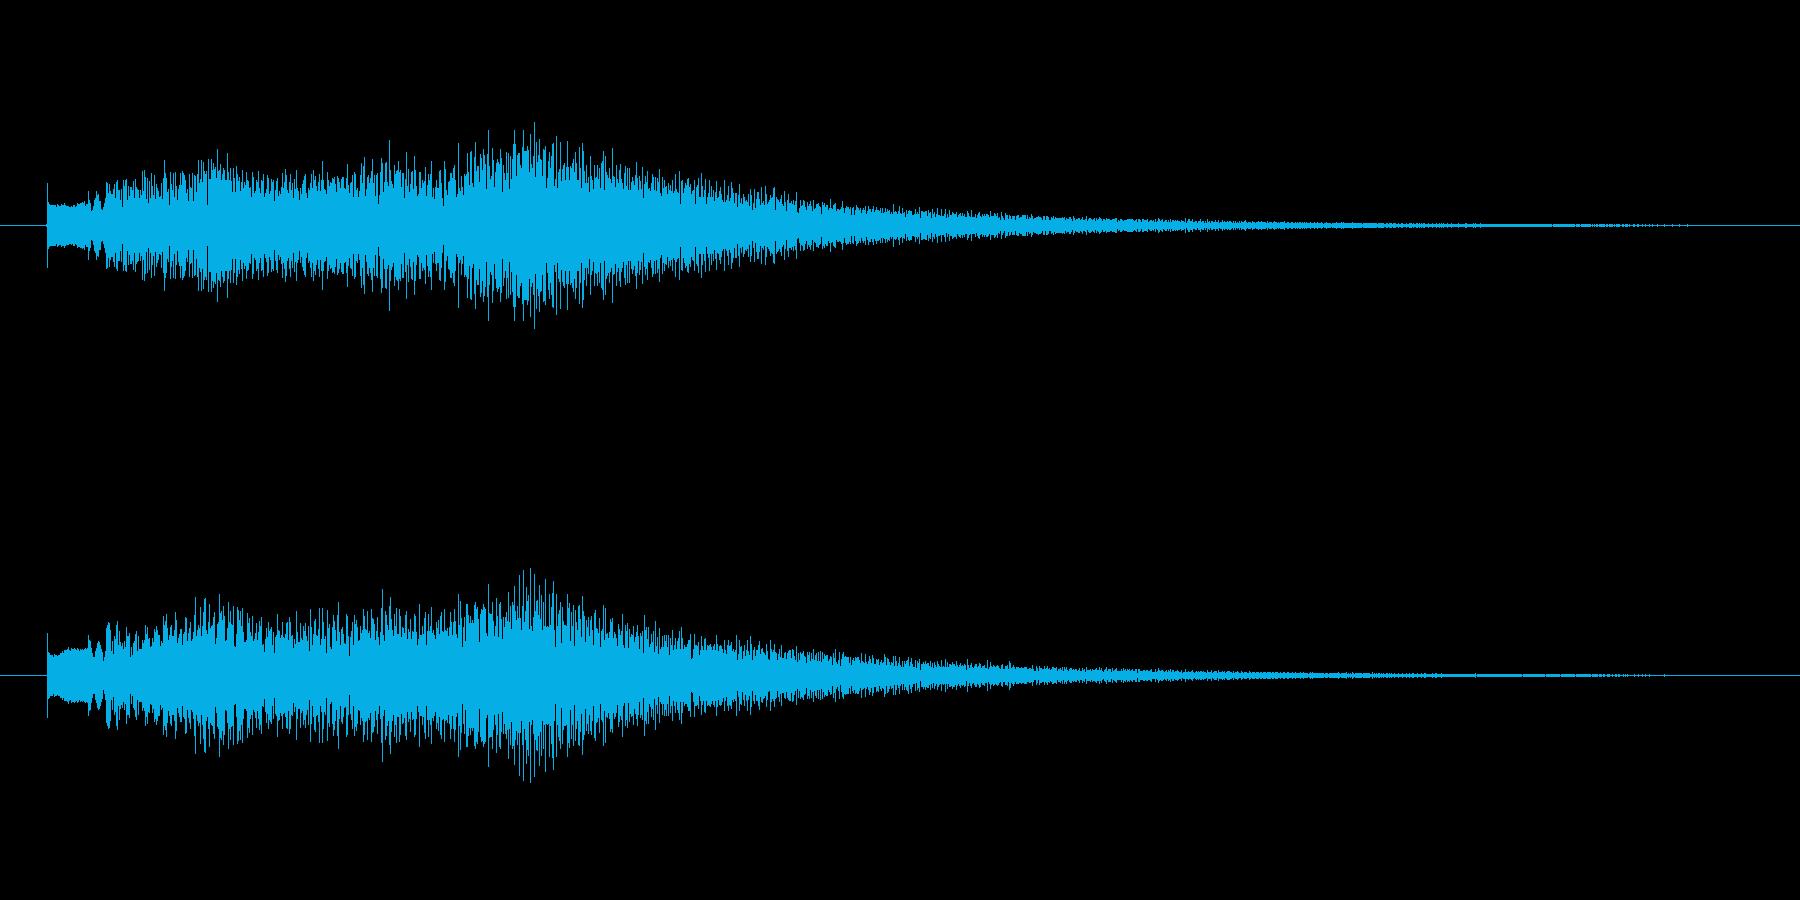 トゥルリントゥルリントゥルリンの再生済みの波形